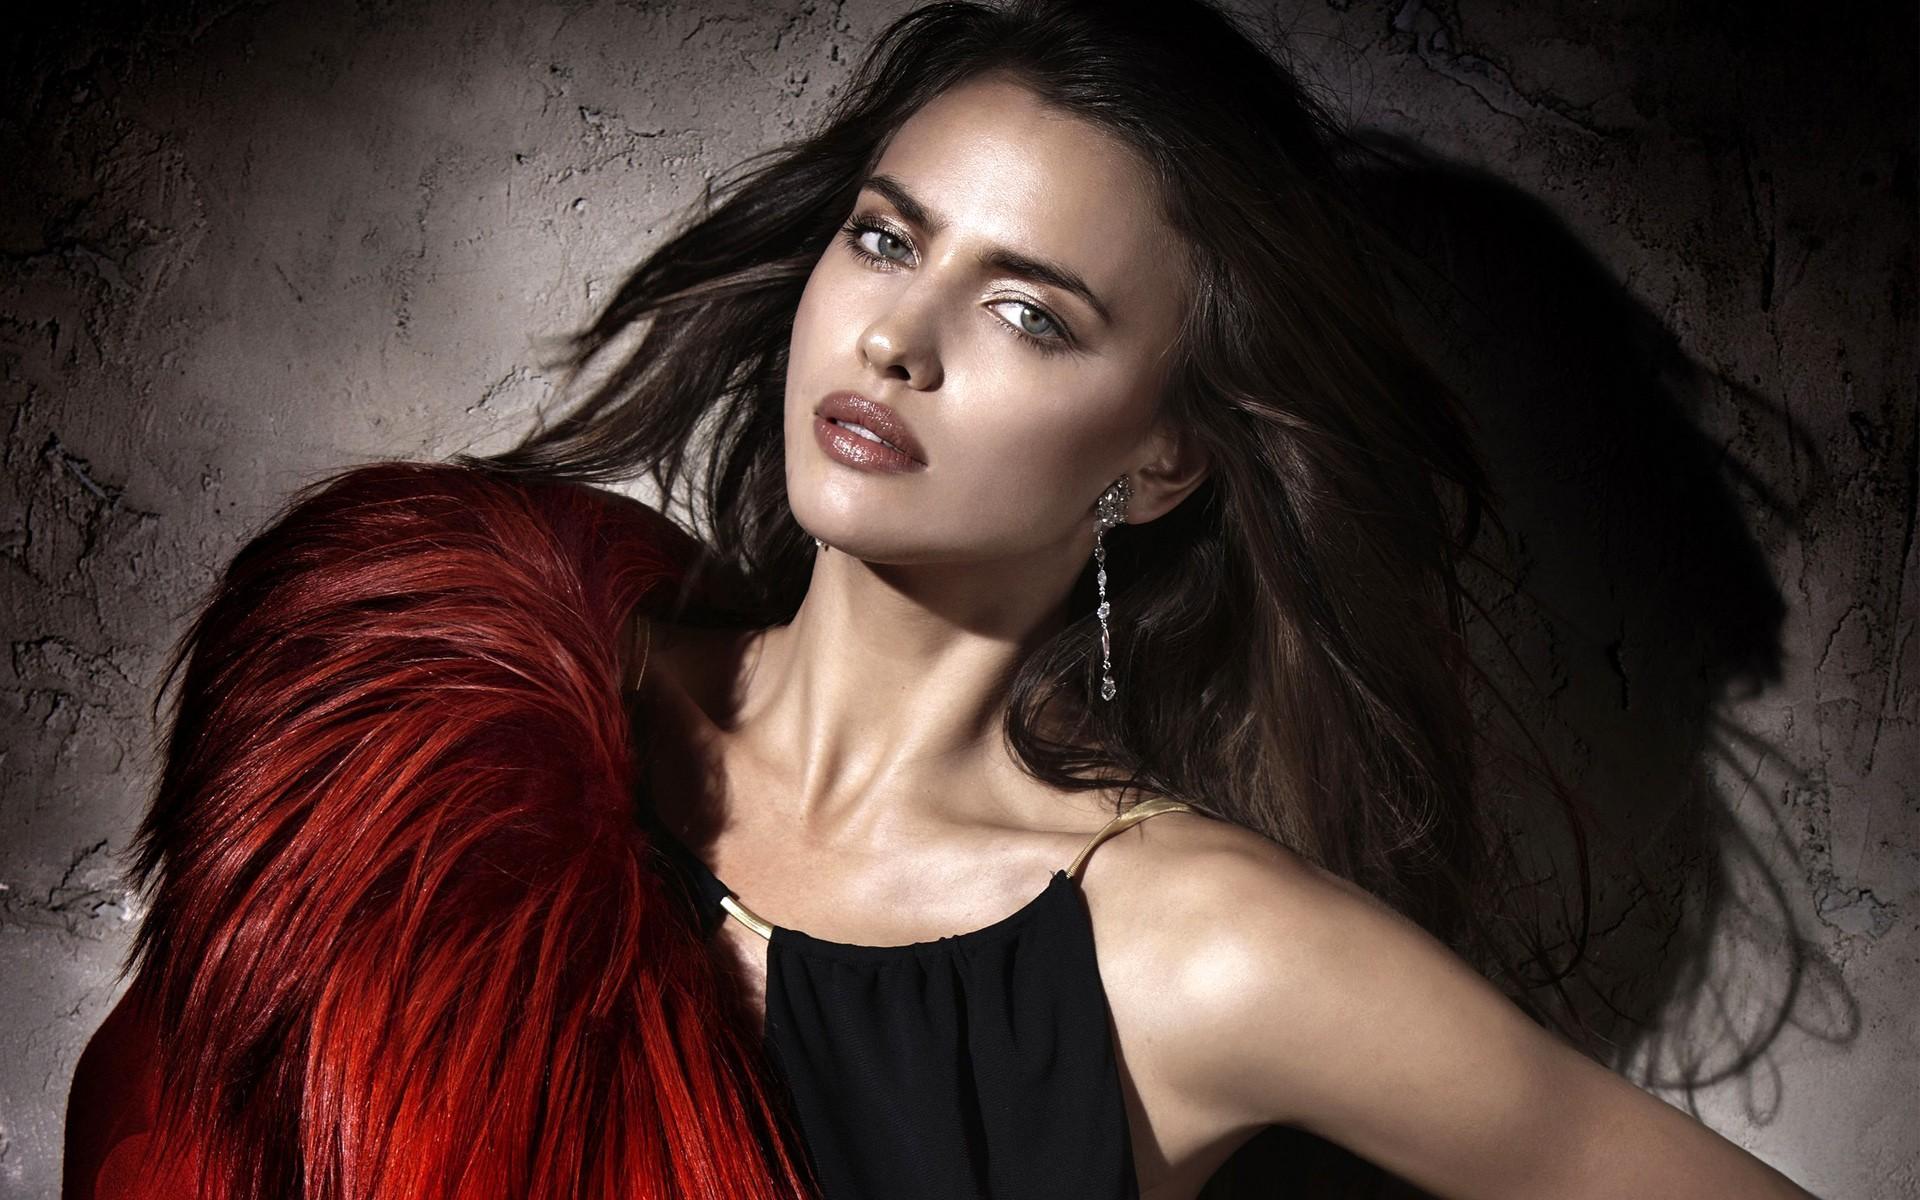 irina shayk 2, hd celebrities, 4k wallpapers, images, backgrounds